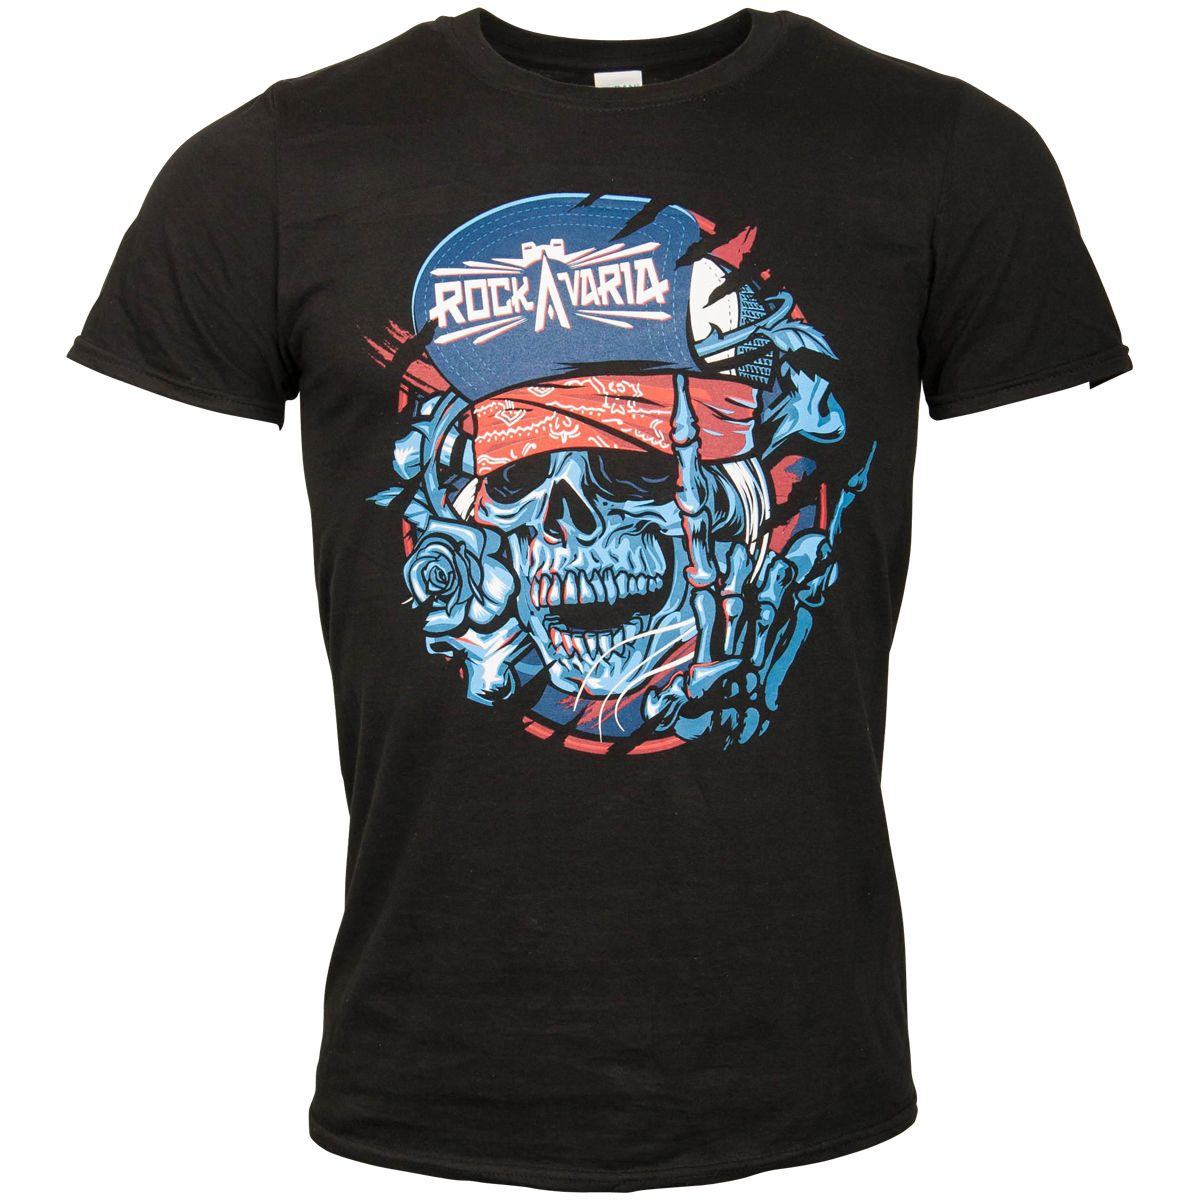 Offizielles Rockavaria 2018 - T-Shirt Skullvaria - schwarz